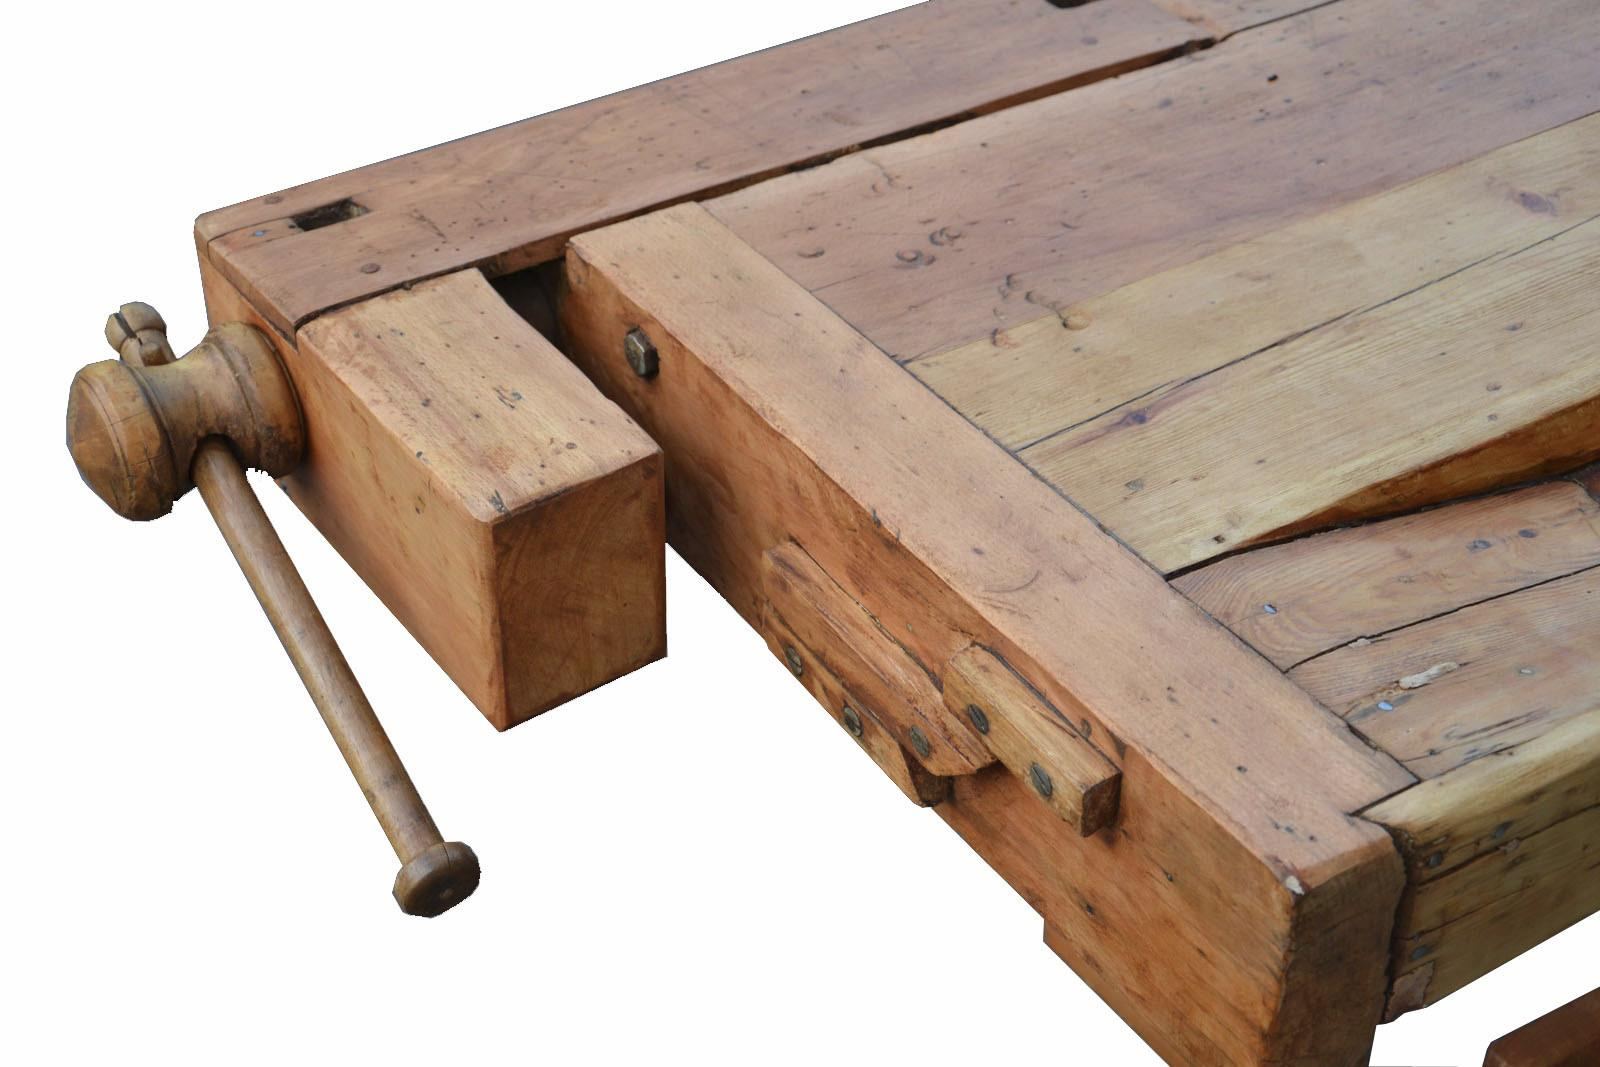 vecchio-tavolo-da-falegname-in-legno-4,3099.jpg?WebbinsCacheCounter=1